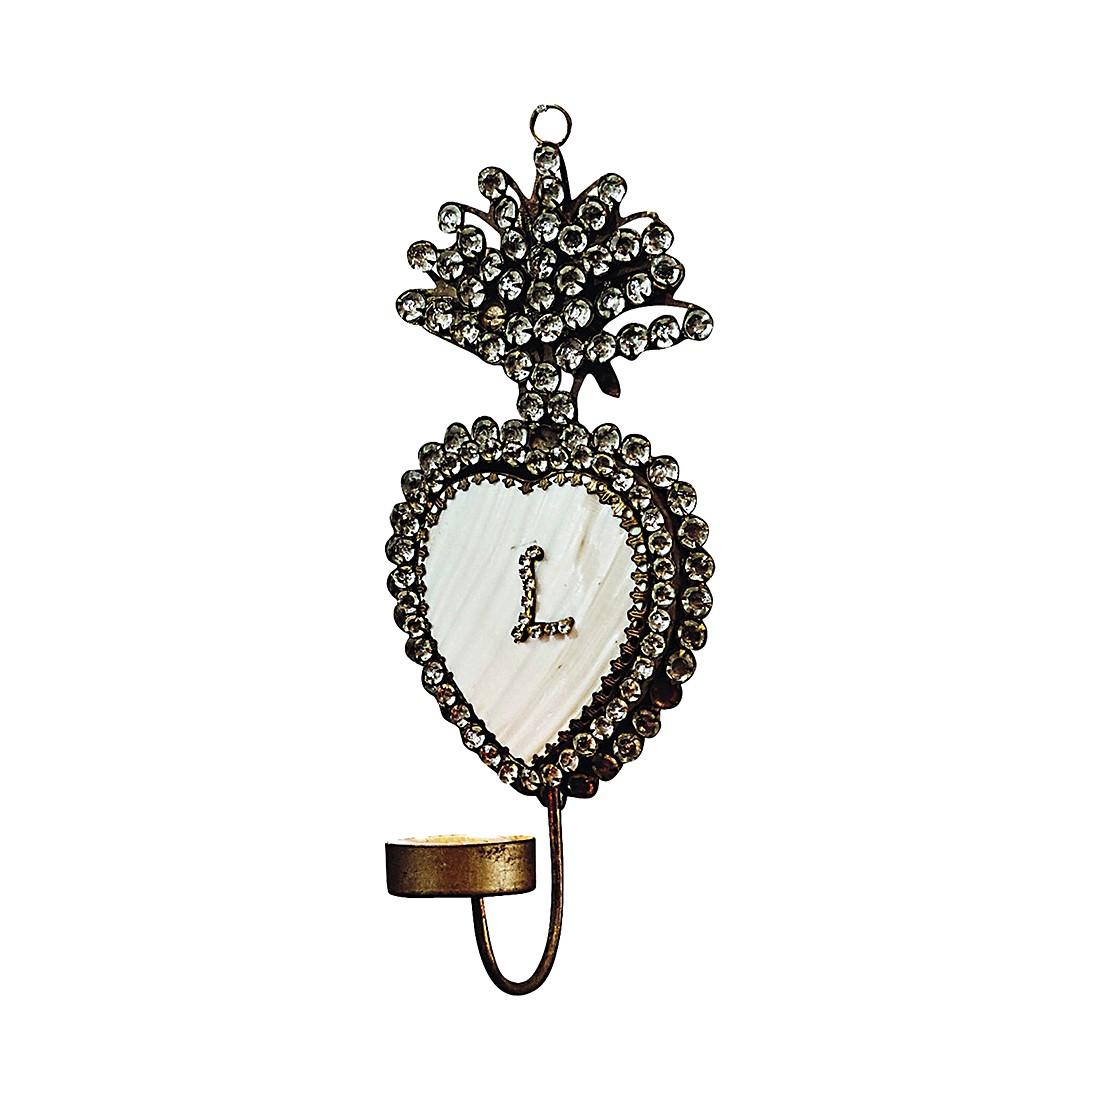 wandkerzenhalter palina eisen glas perlmutt antikgold loberon g nstig bestellen. Black Bedroom Furniture Sets. Home Design Ideas